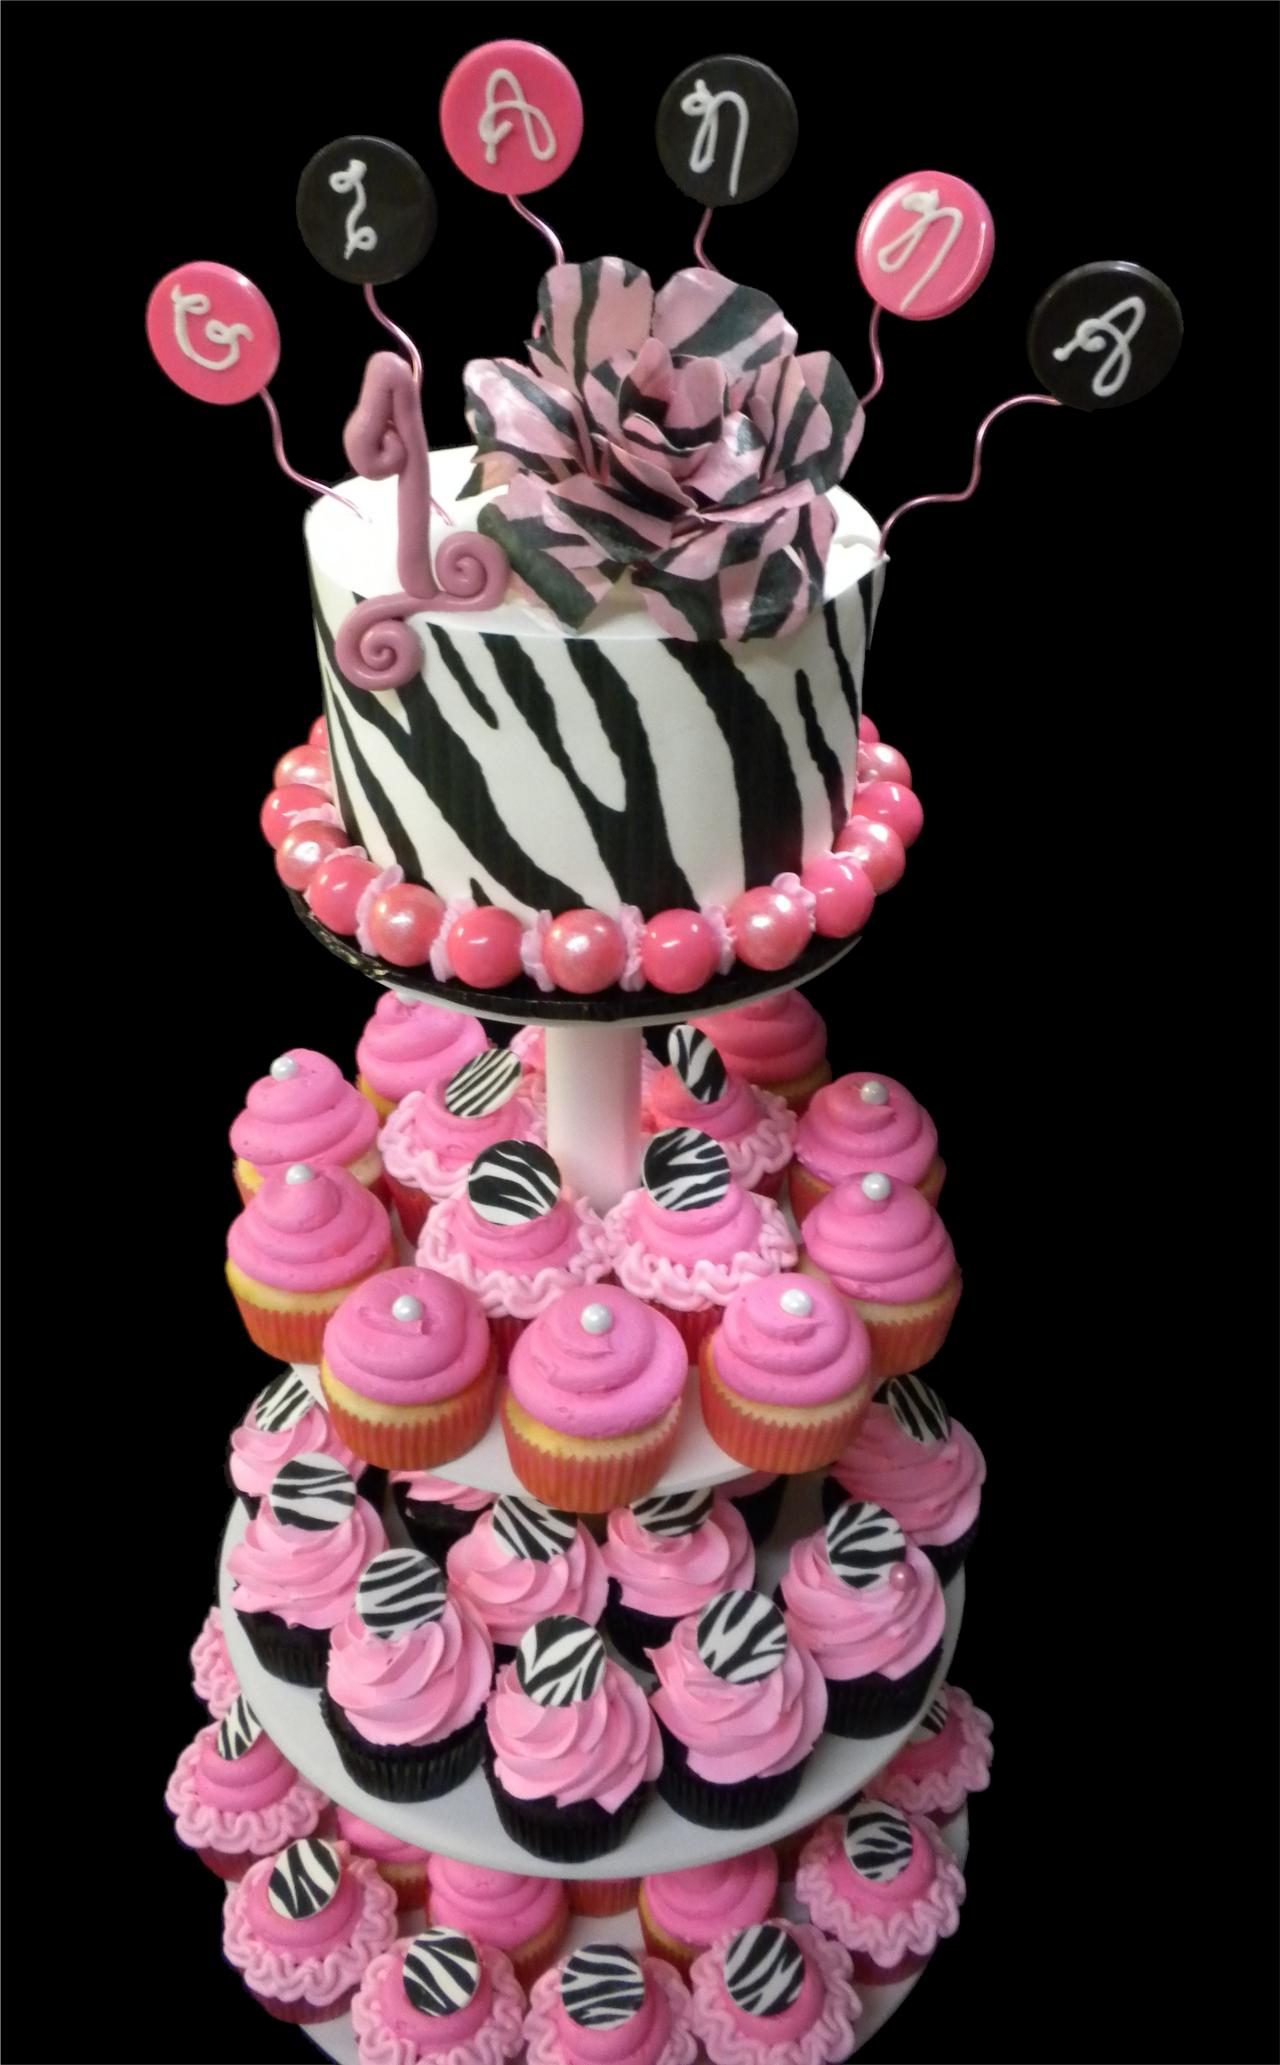 Birthday Cakes | Sugar Showcase